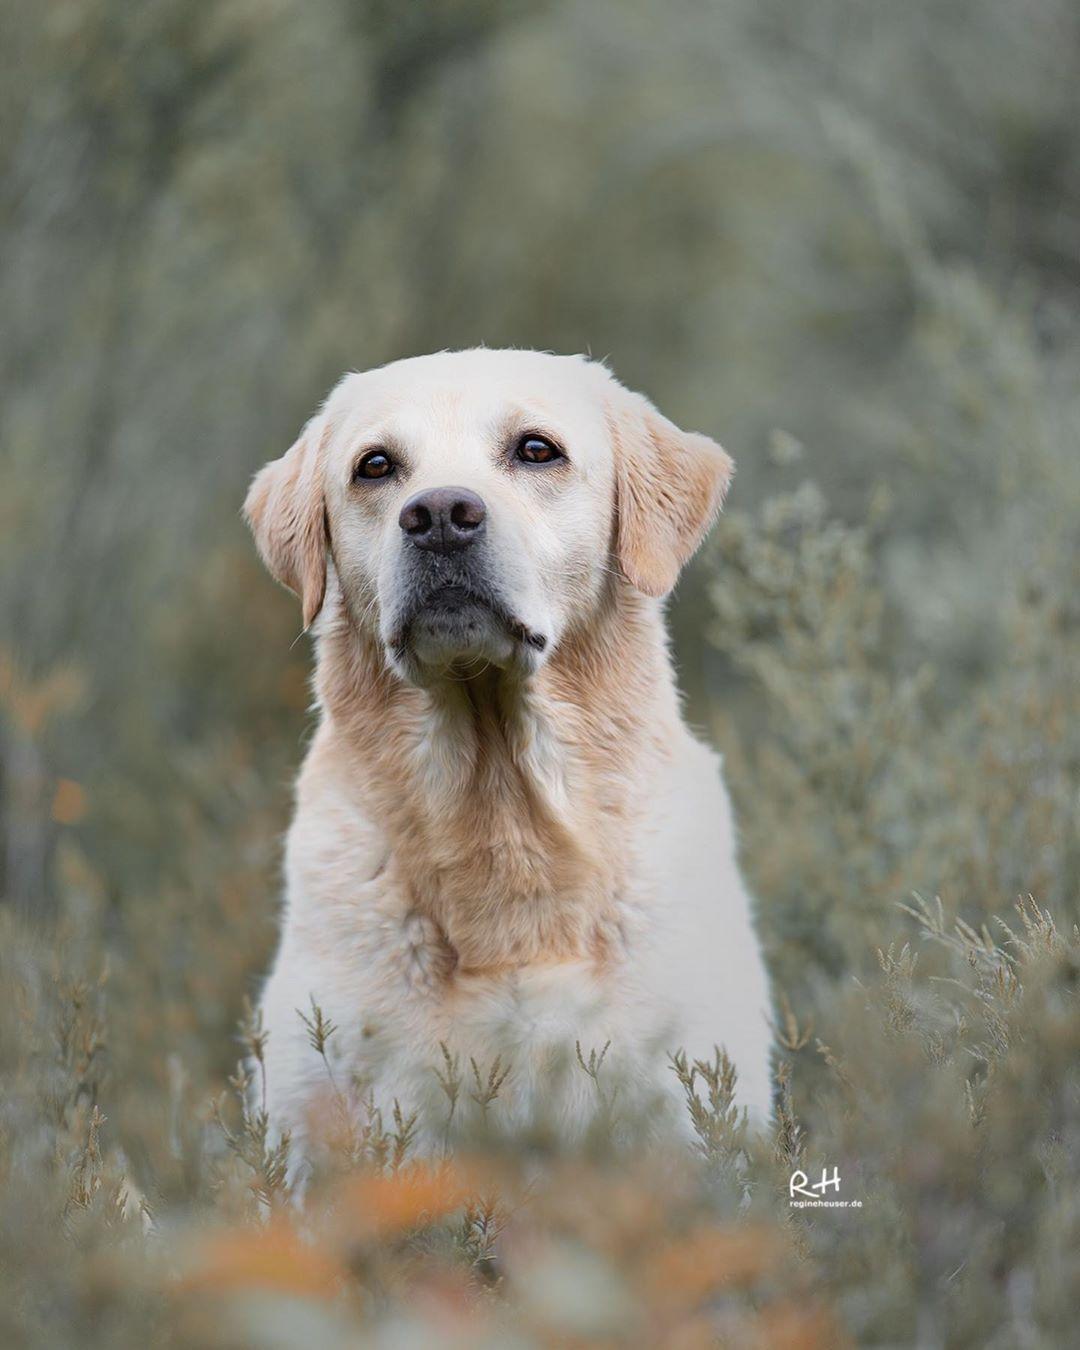 Topmodel Chuck Follow Regine Heuser Labradorretriever Labradors Fotoworkshop Dogs Hunde Hundelie Golden Retriever Labrador Retriever Retriever